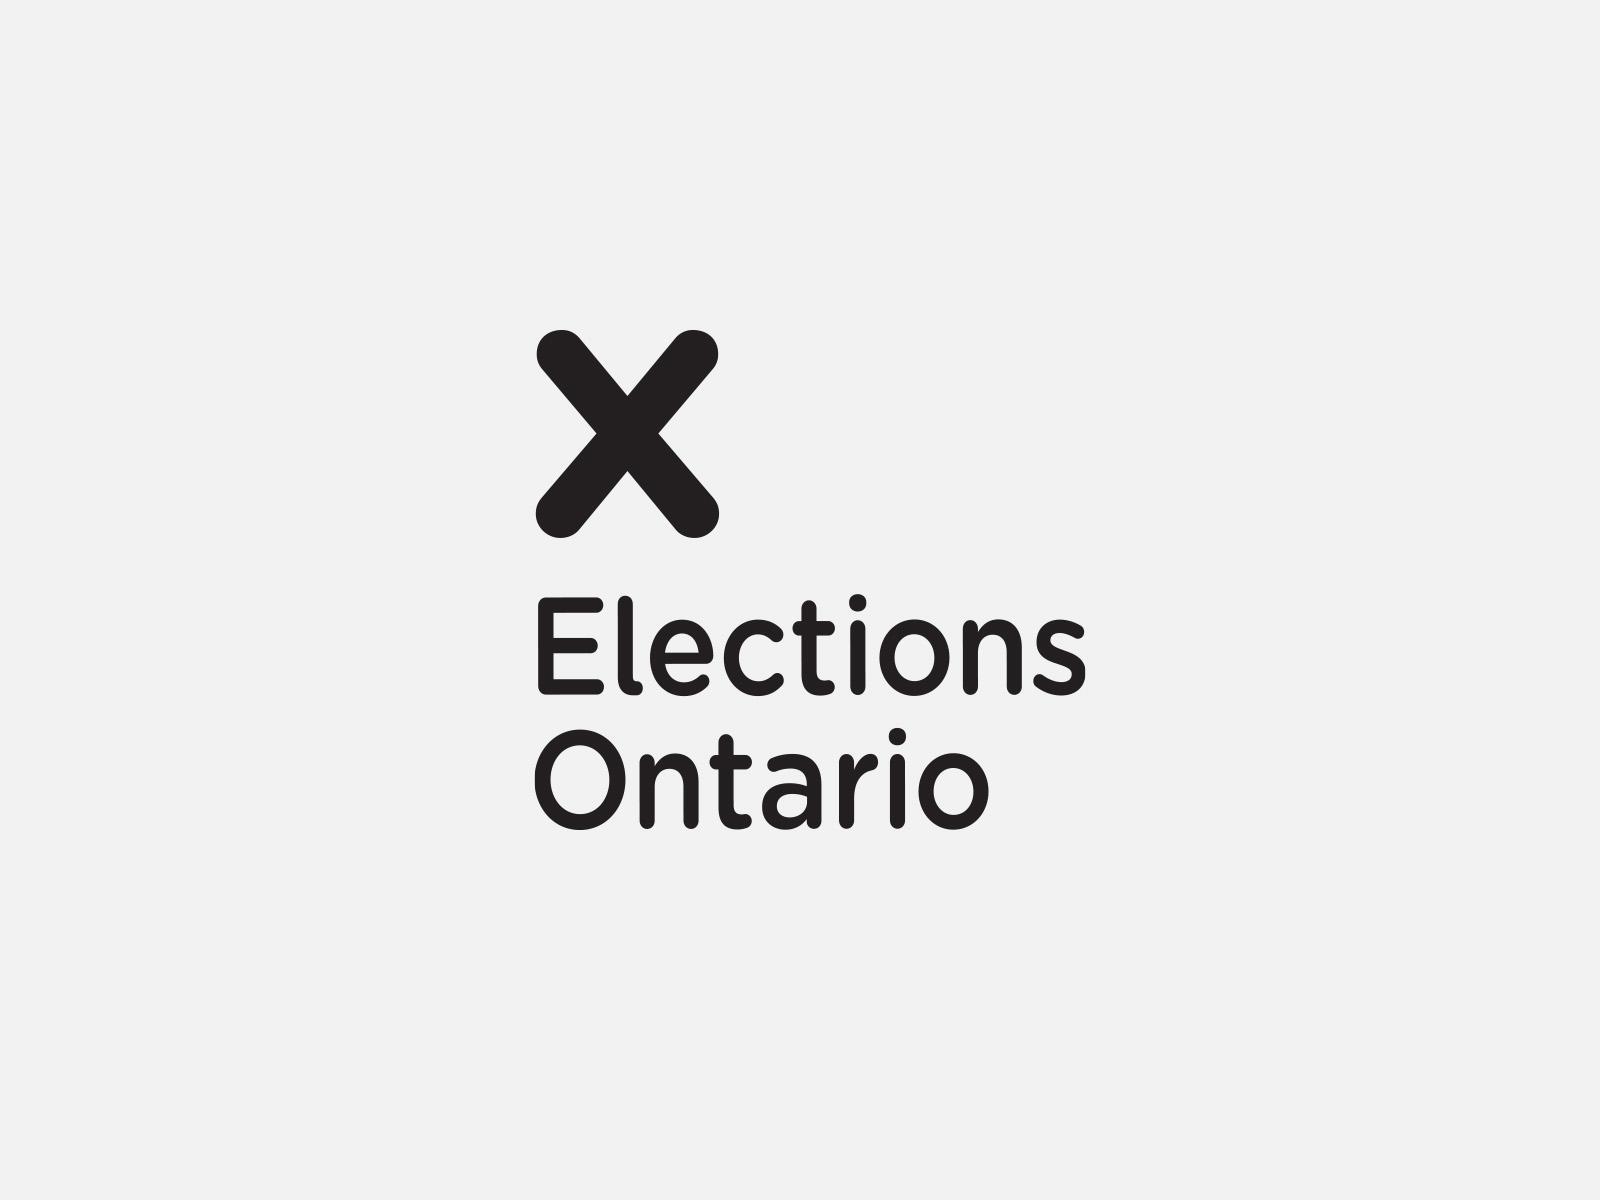 Elections Ontario by Leo Burnett Design